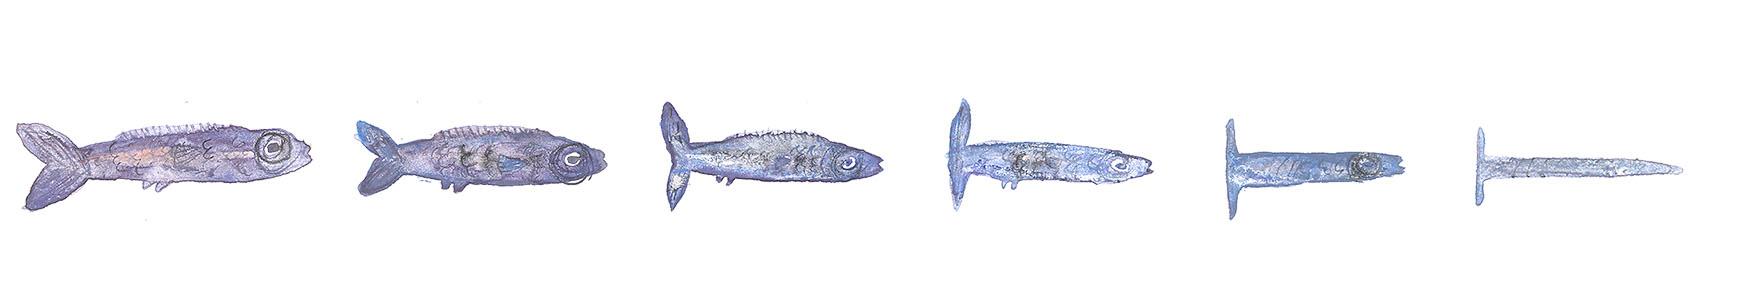 Transformation - fish III